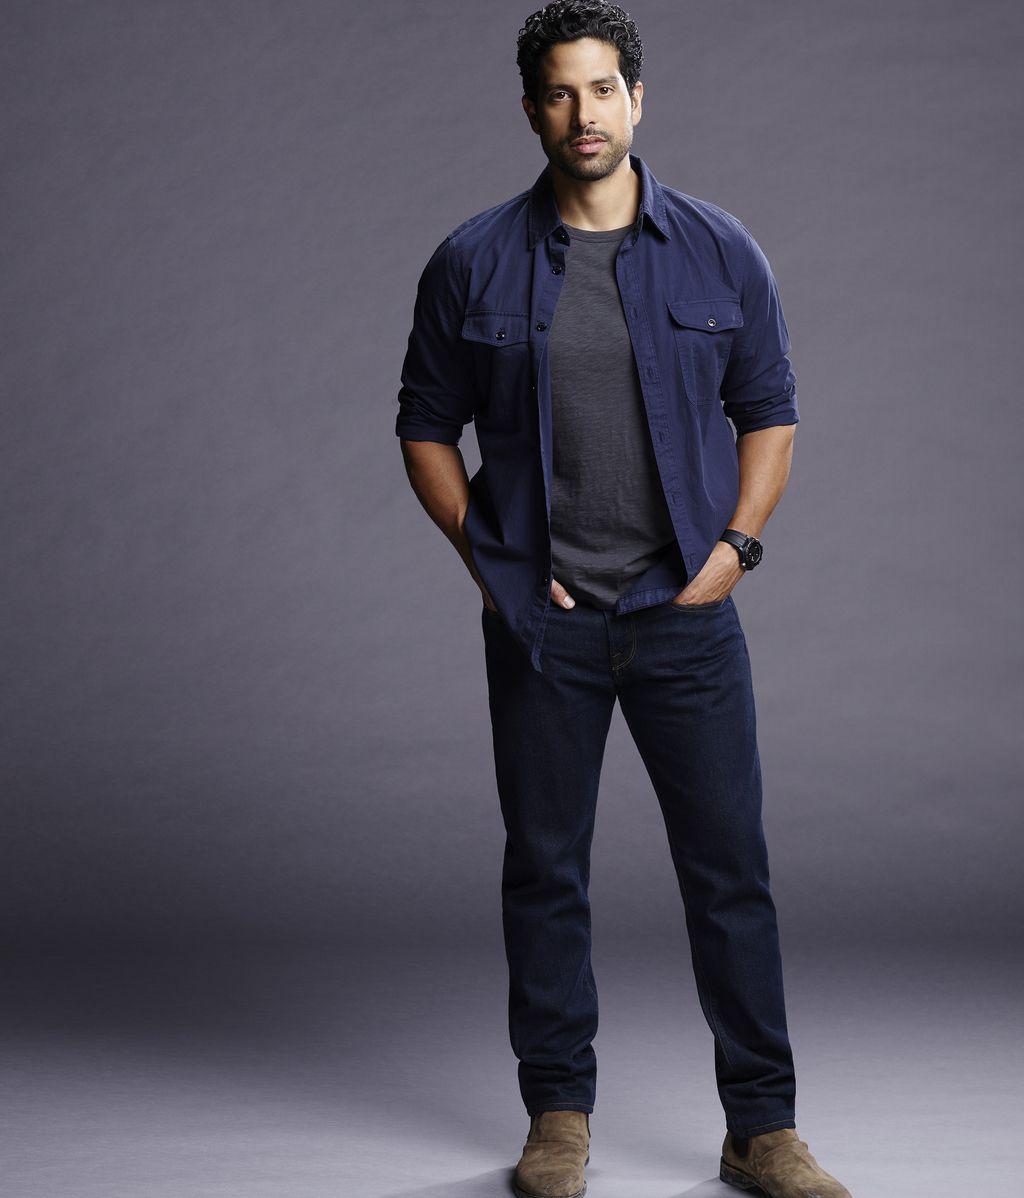 Personajes de la 12ª temporada de 'Mentes criminales': Adam Rodríguez es Luke Alvez